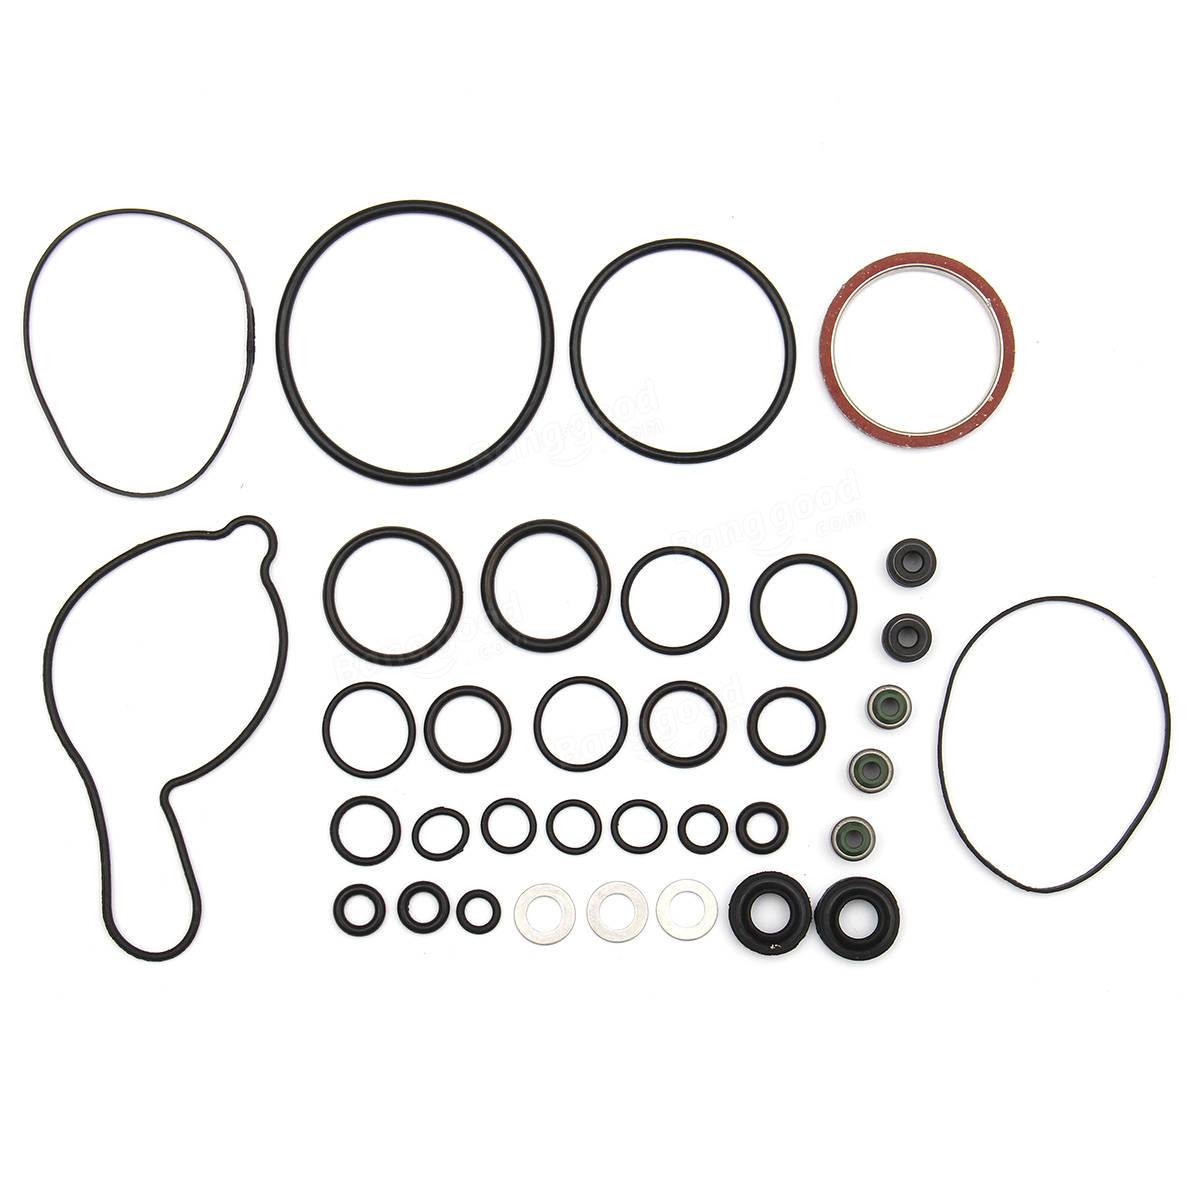 Motorcycle Engine Gaskets O-Ring Kit Set for Yamaha YFZ450